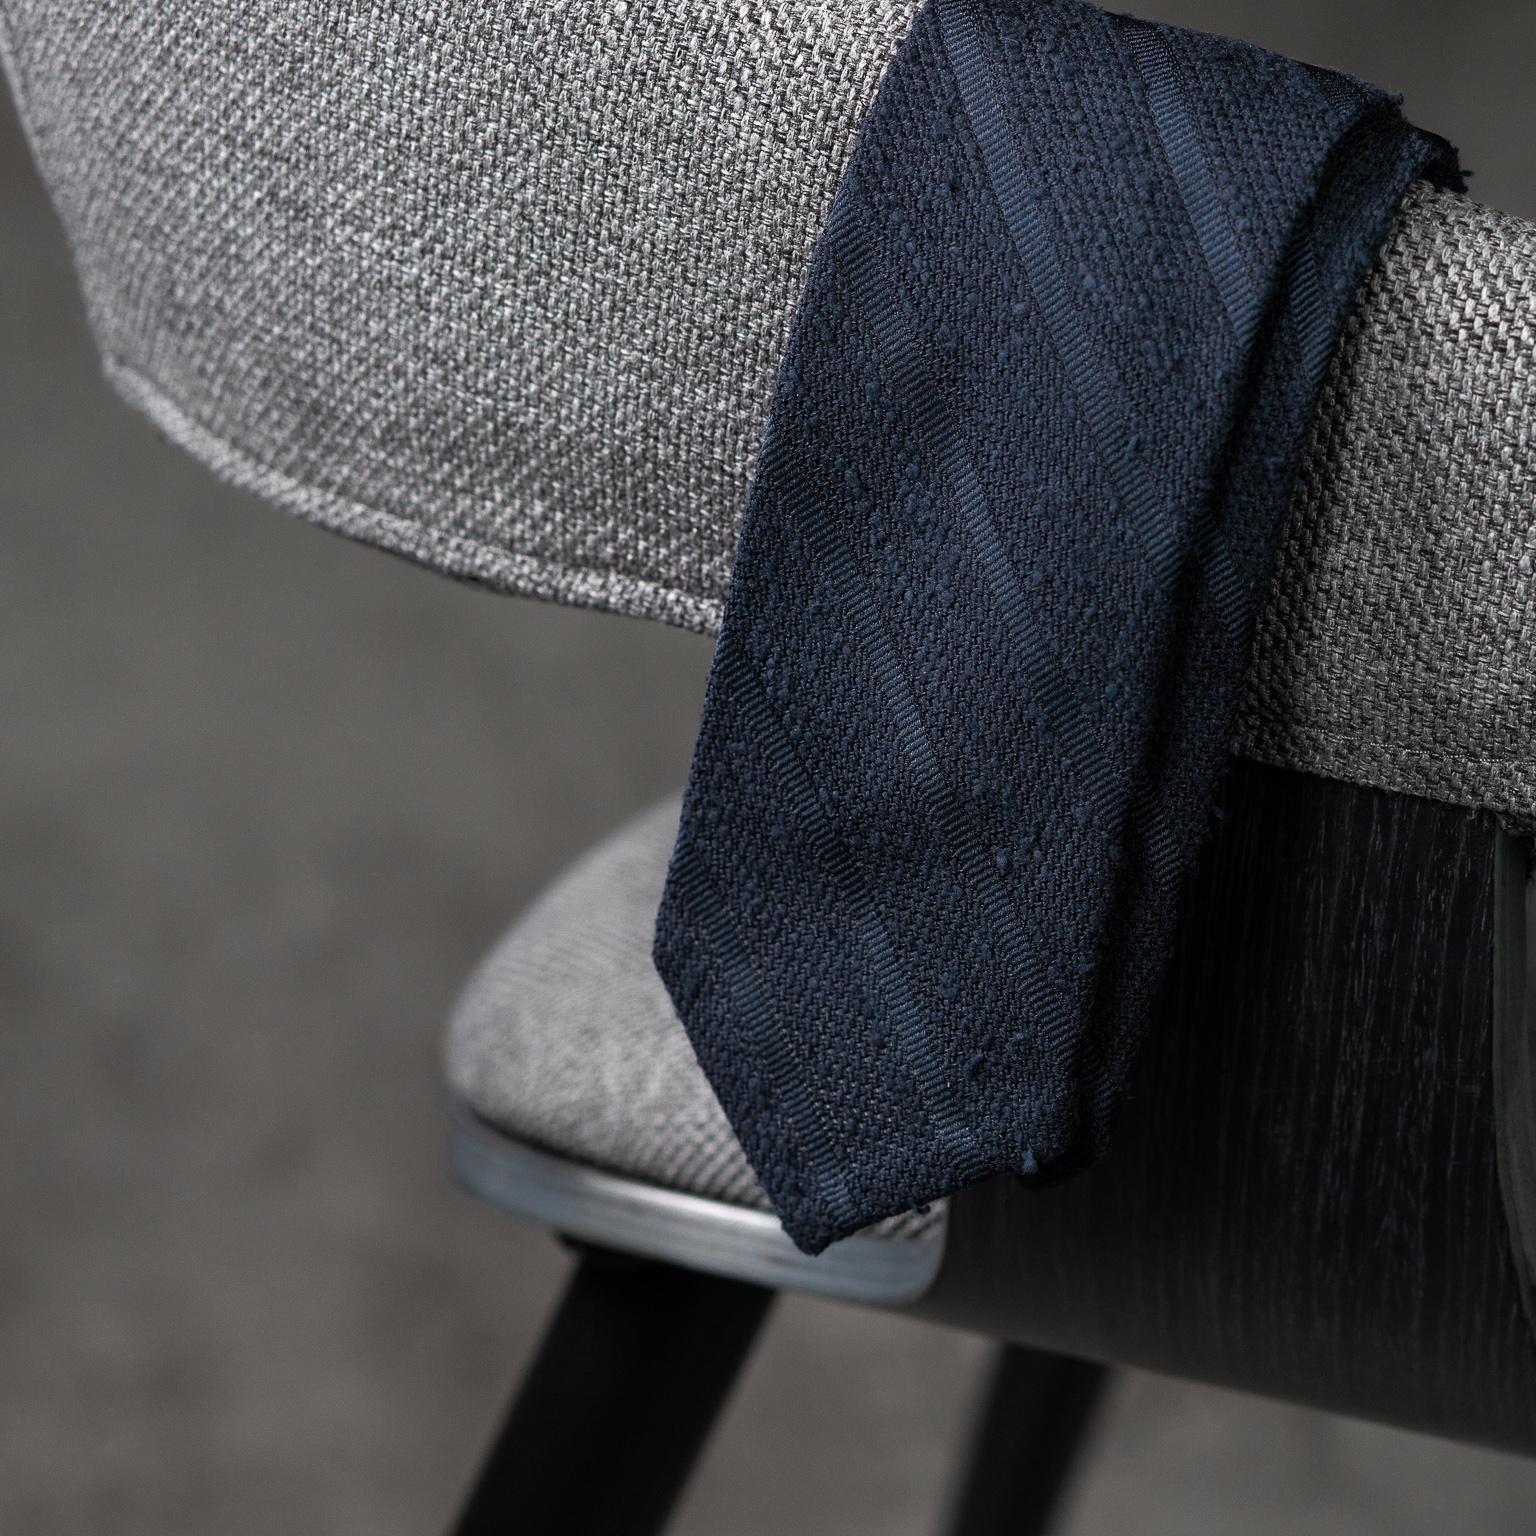 SHANTUNG-0358-Tie-Initials-Corbata-Iniciales-The-Seelk-2